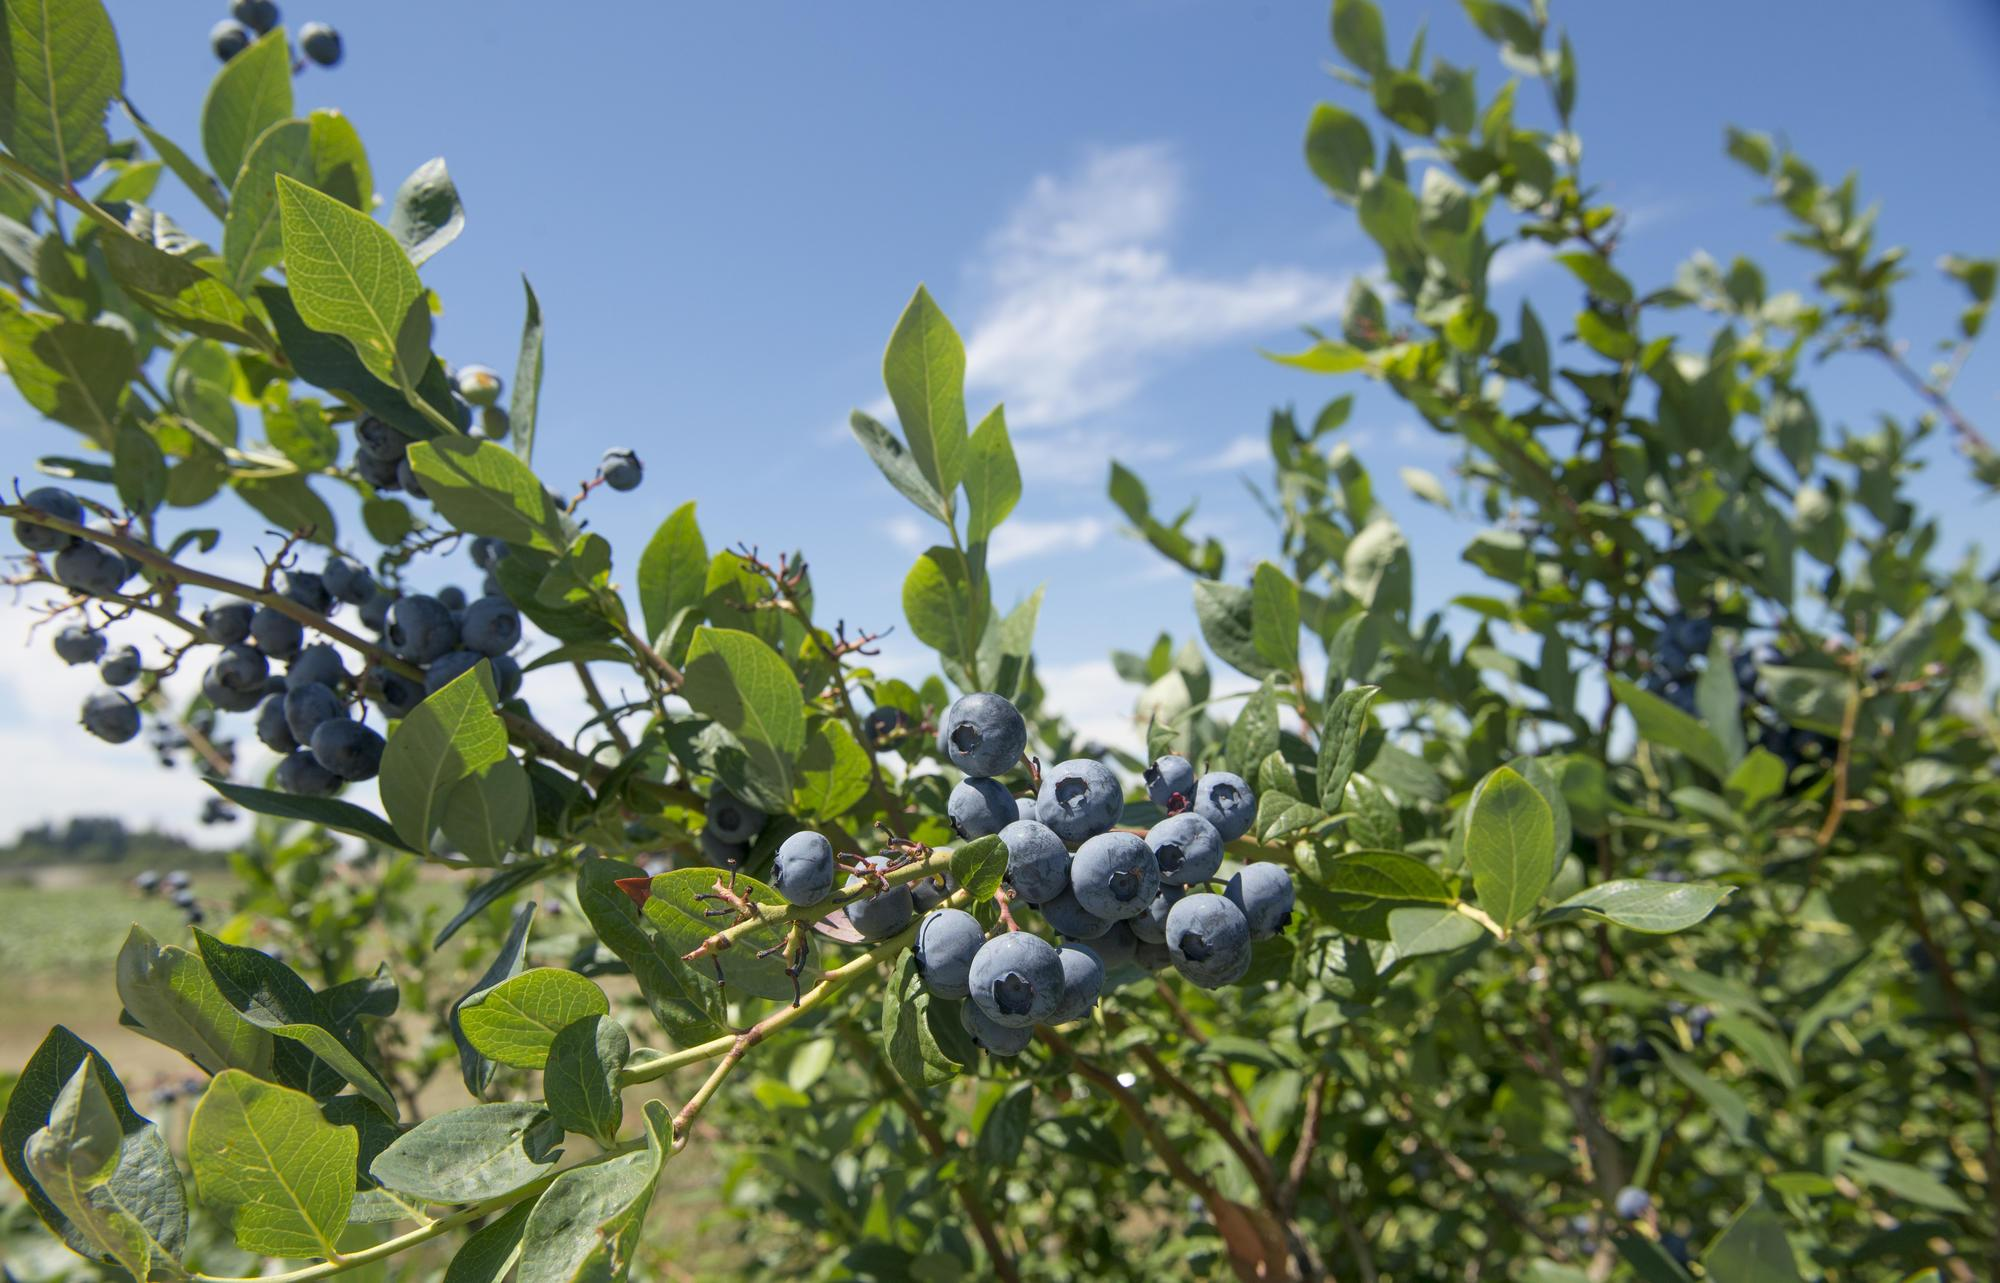 how blueberry plants develop